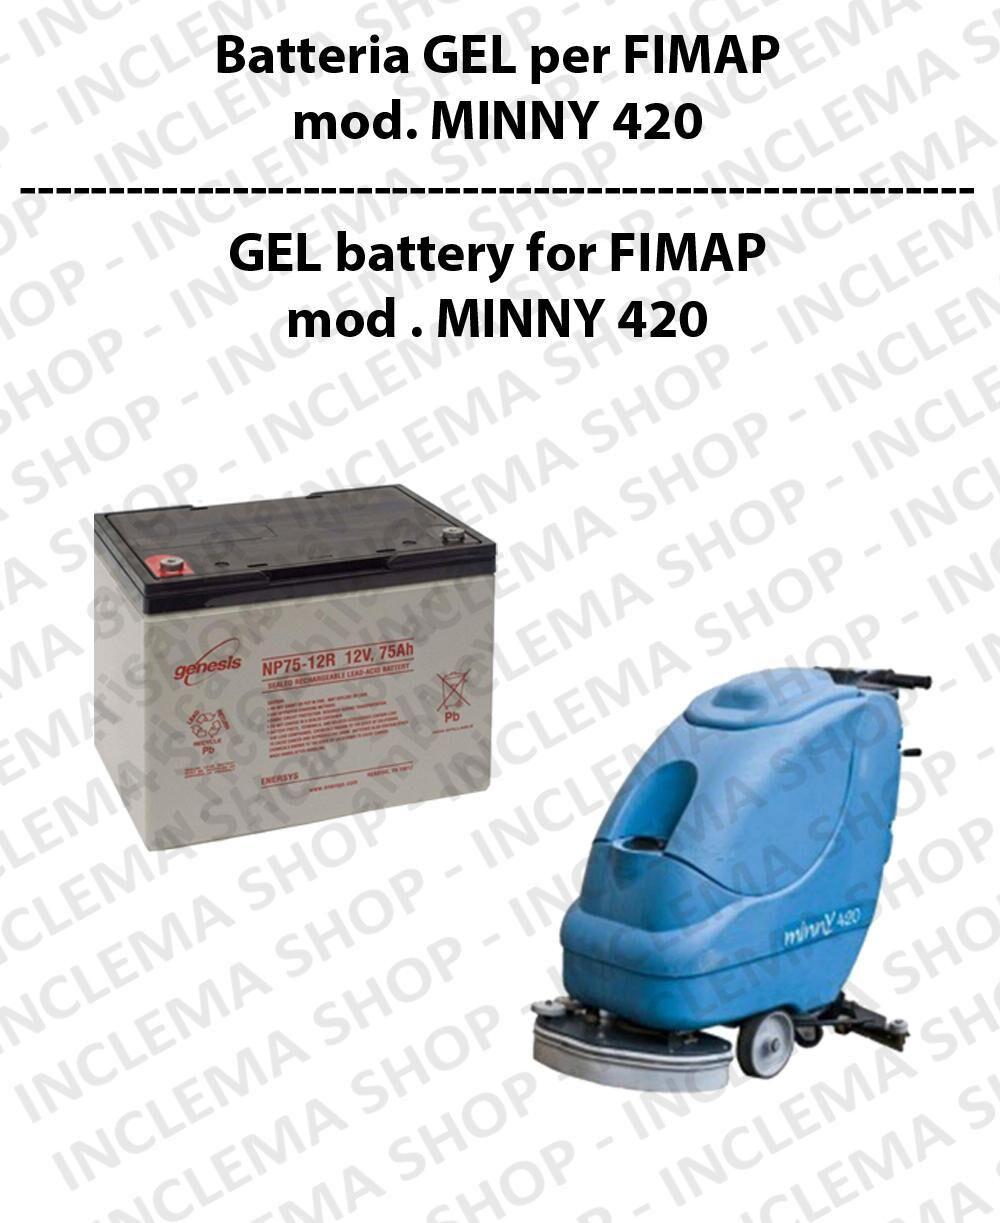 Fimap Batteria al GEL per lavapavimenti modello MINNY 420